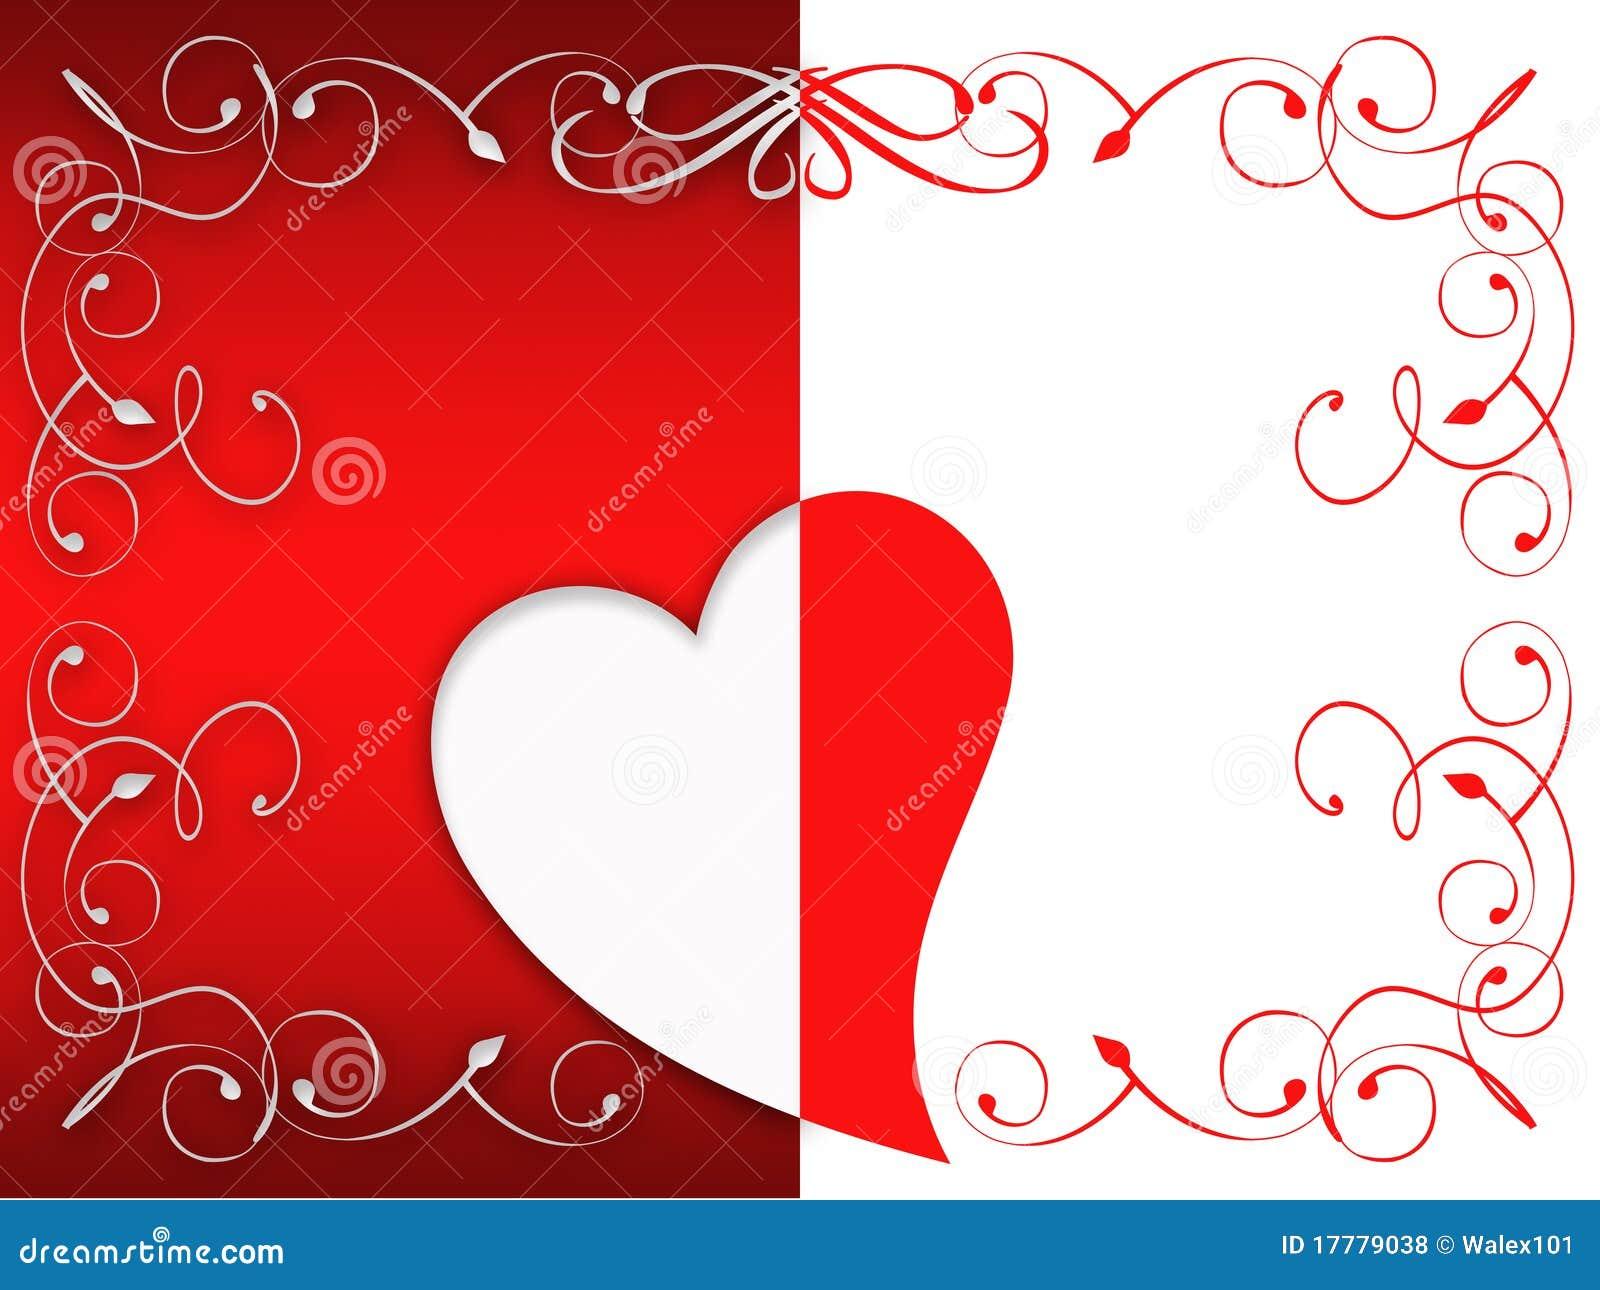 Valentine Greeting Card Royalty Free Stock Photos - Image: 17779038